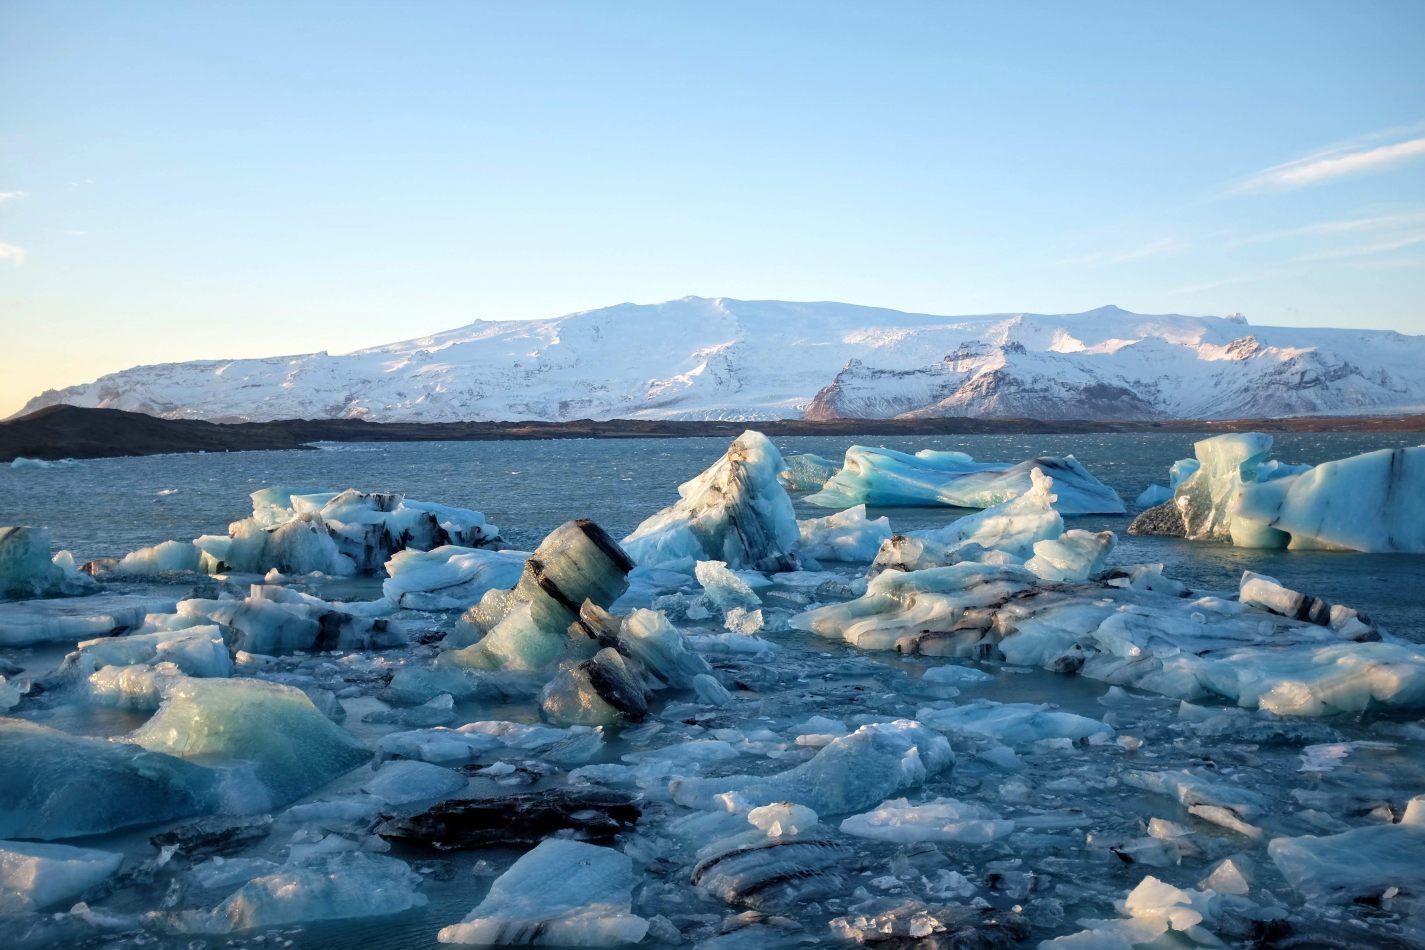 Hibiscus & Nomada : Iceland - Jokulsarlon Glacier Lagoon